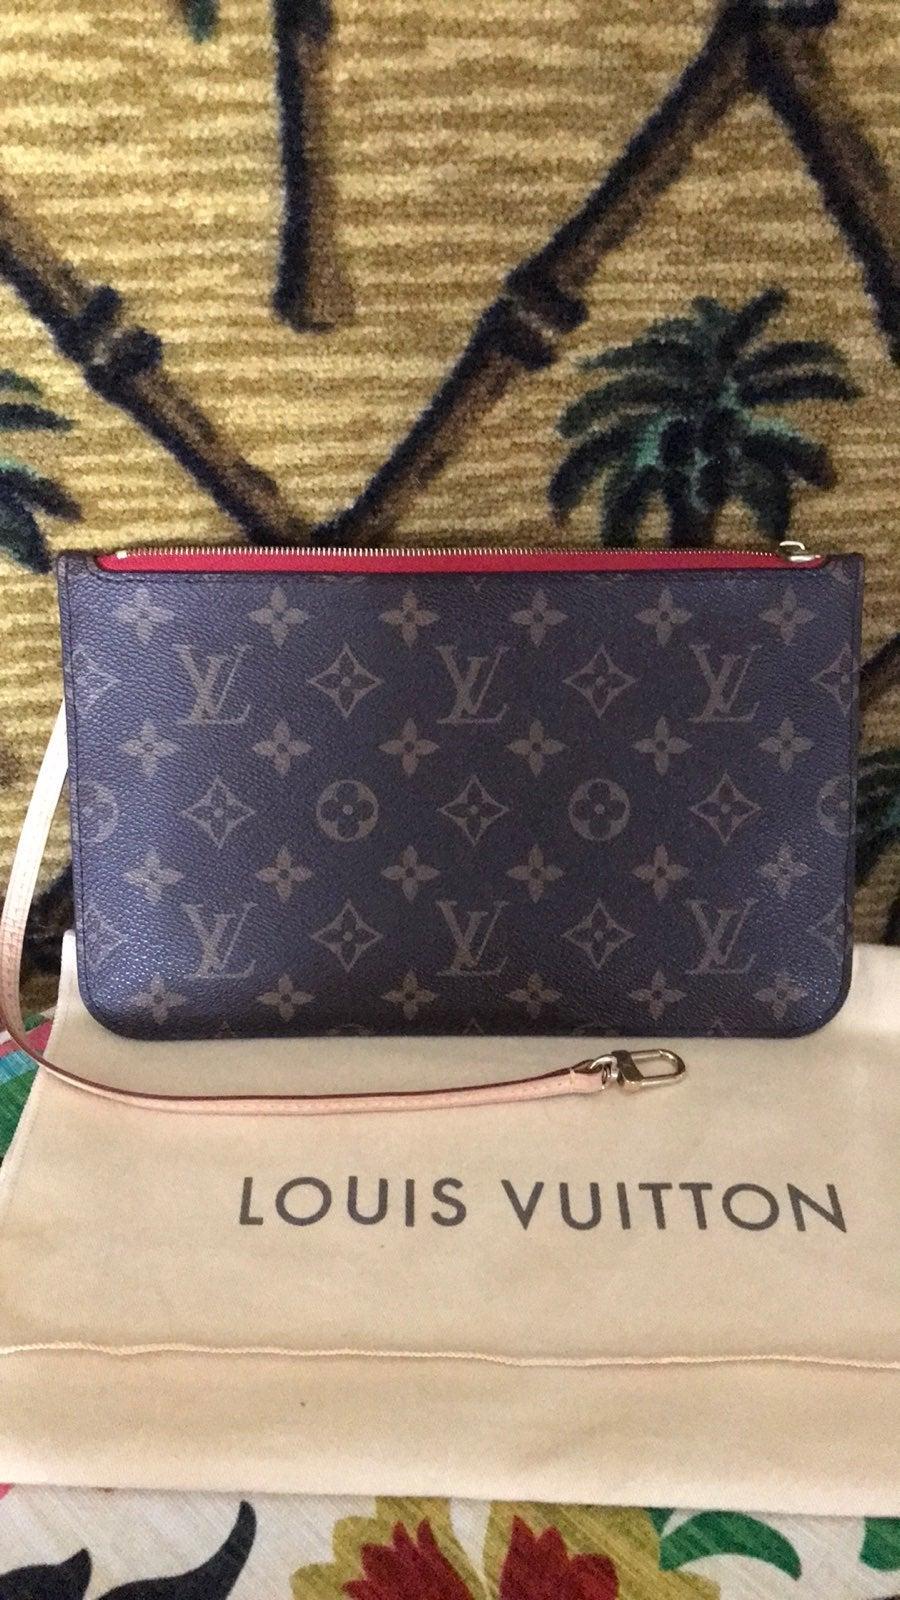 Louis Vuitton neverfull mm pochette